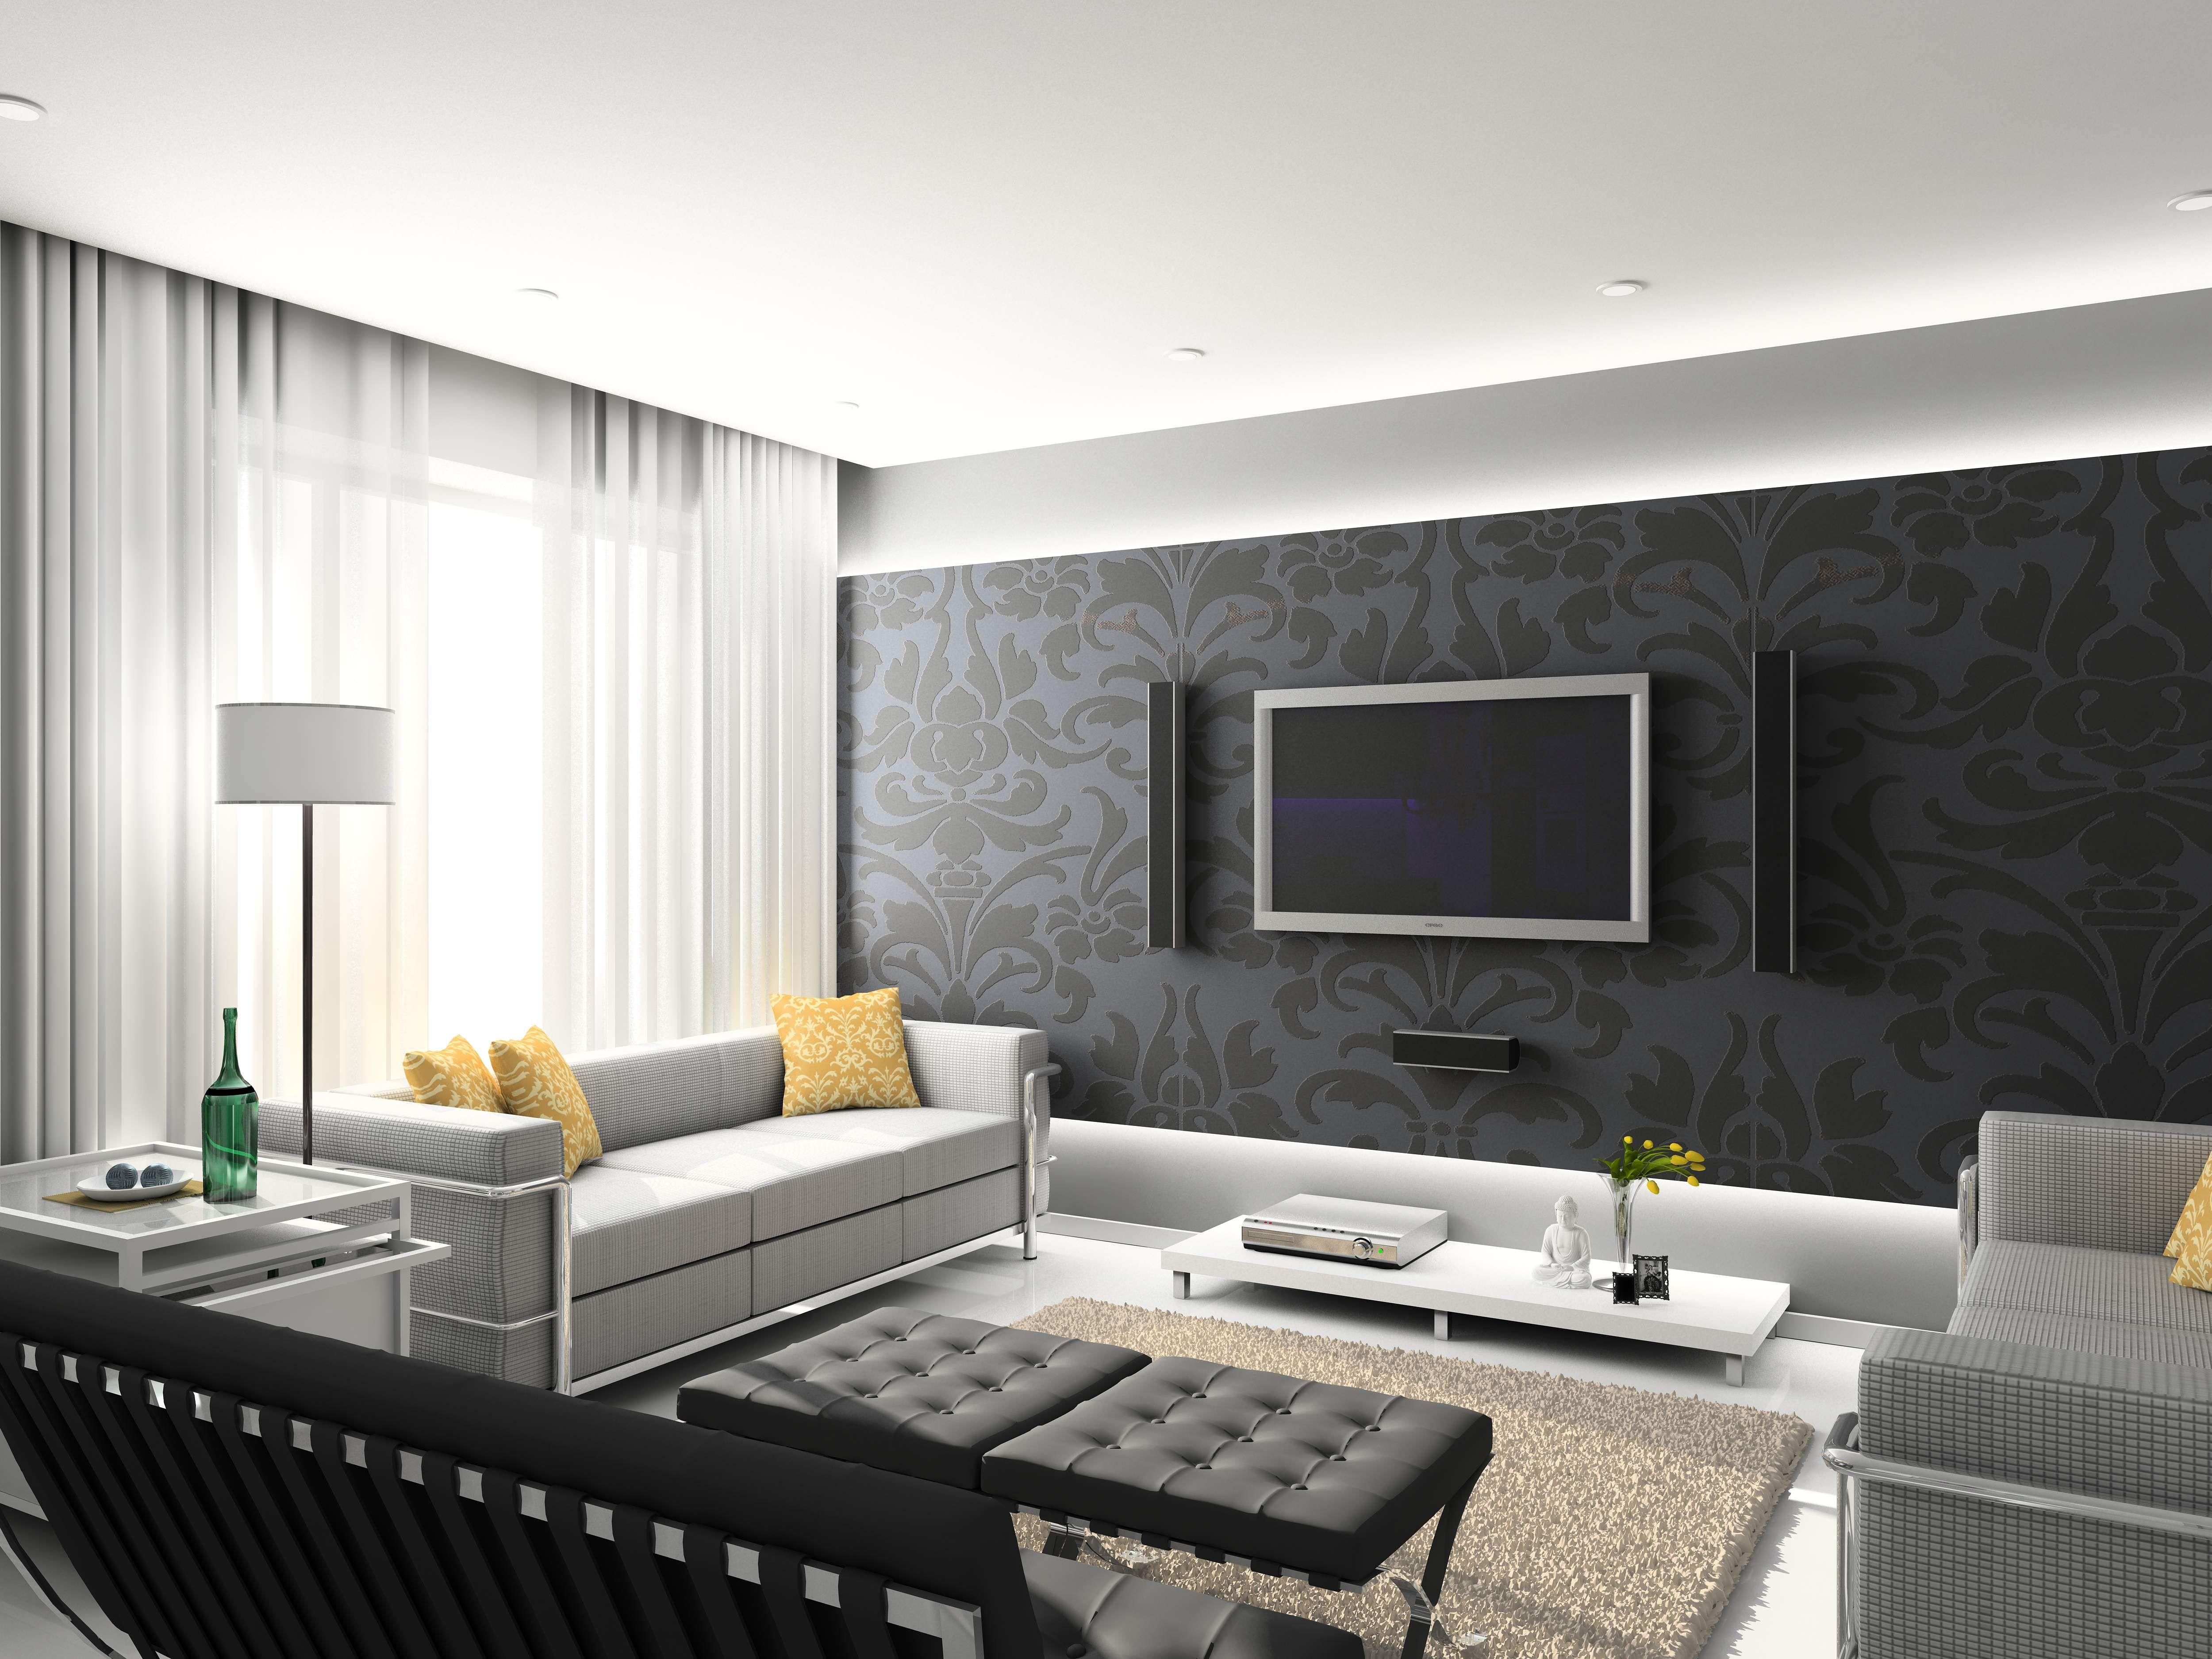 House Design Ideas The Natural Designer Living Room Ideas Ideas